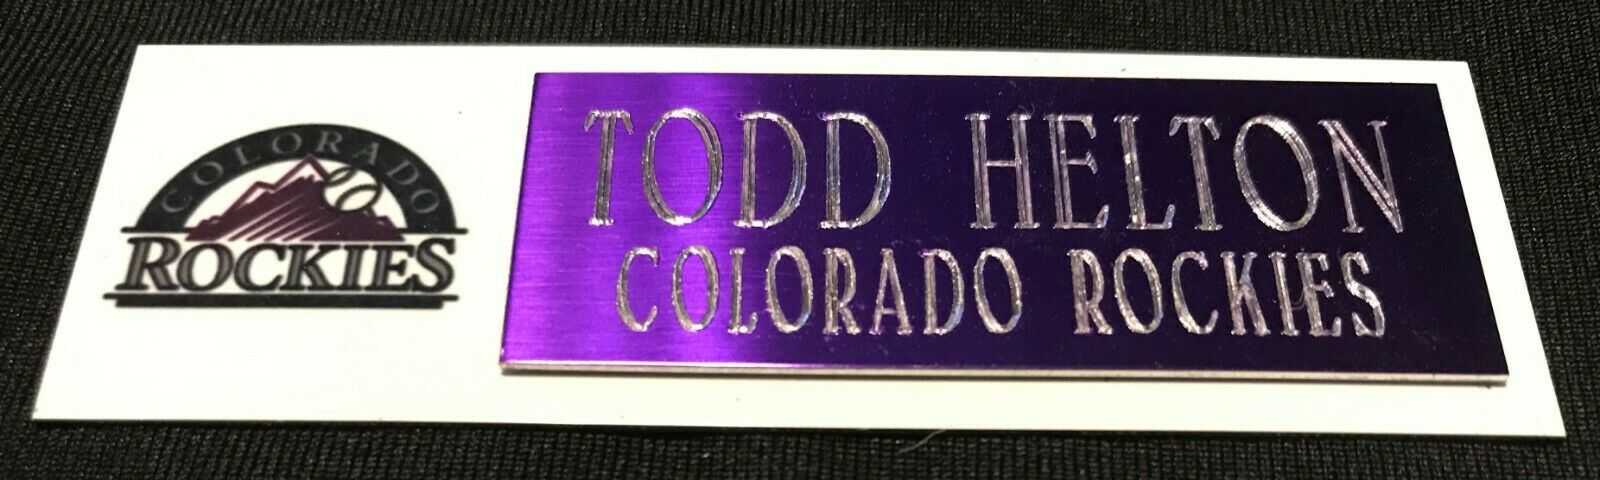 TODD HELTON COLORADO ROCKIES  NAMEPLATE FOR BASEBALL/MINI HE